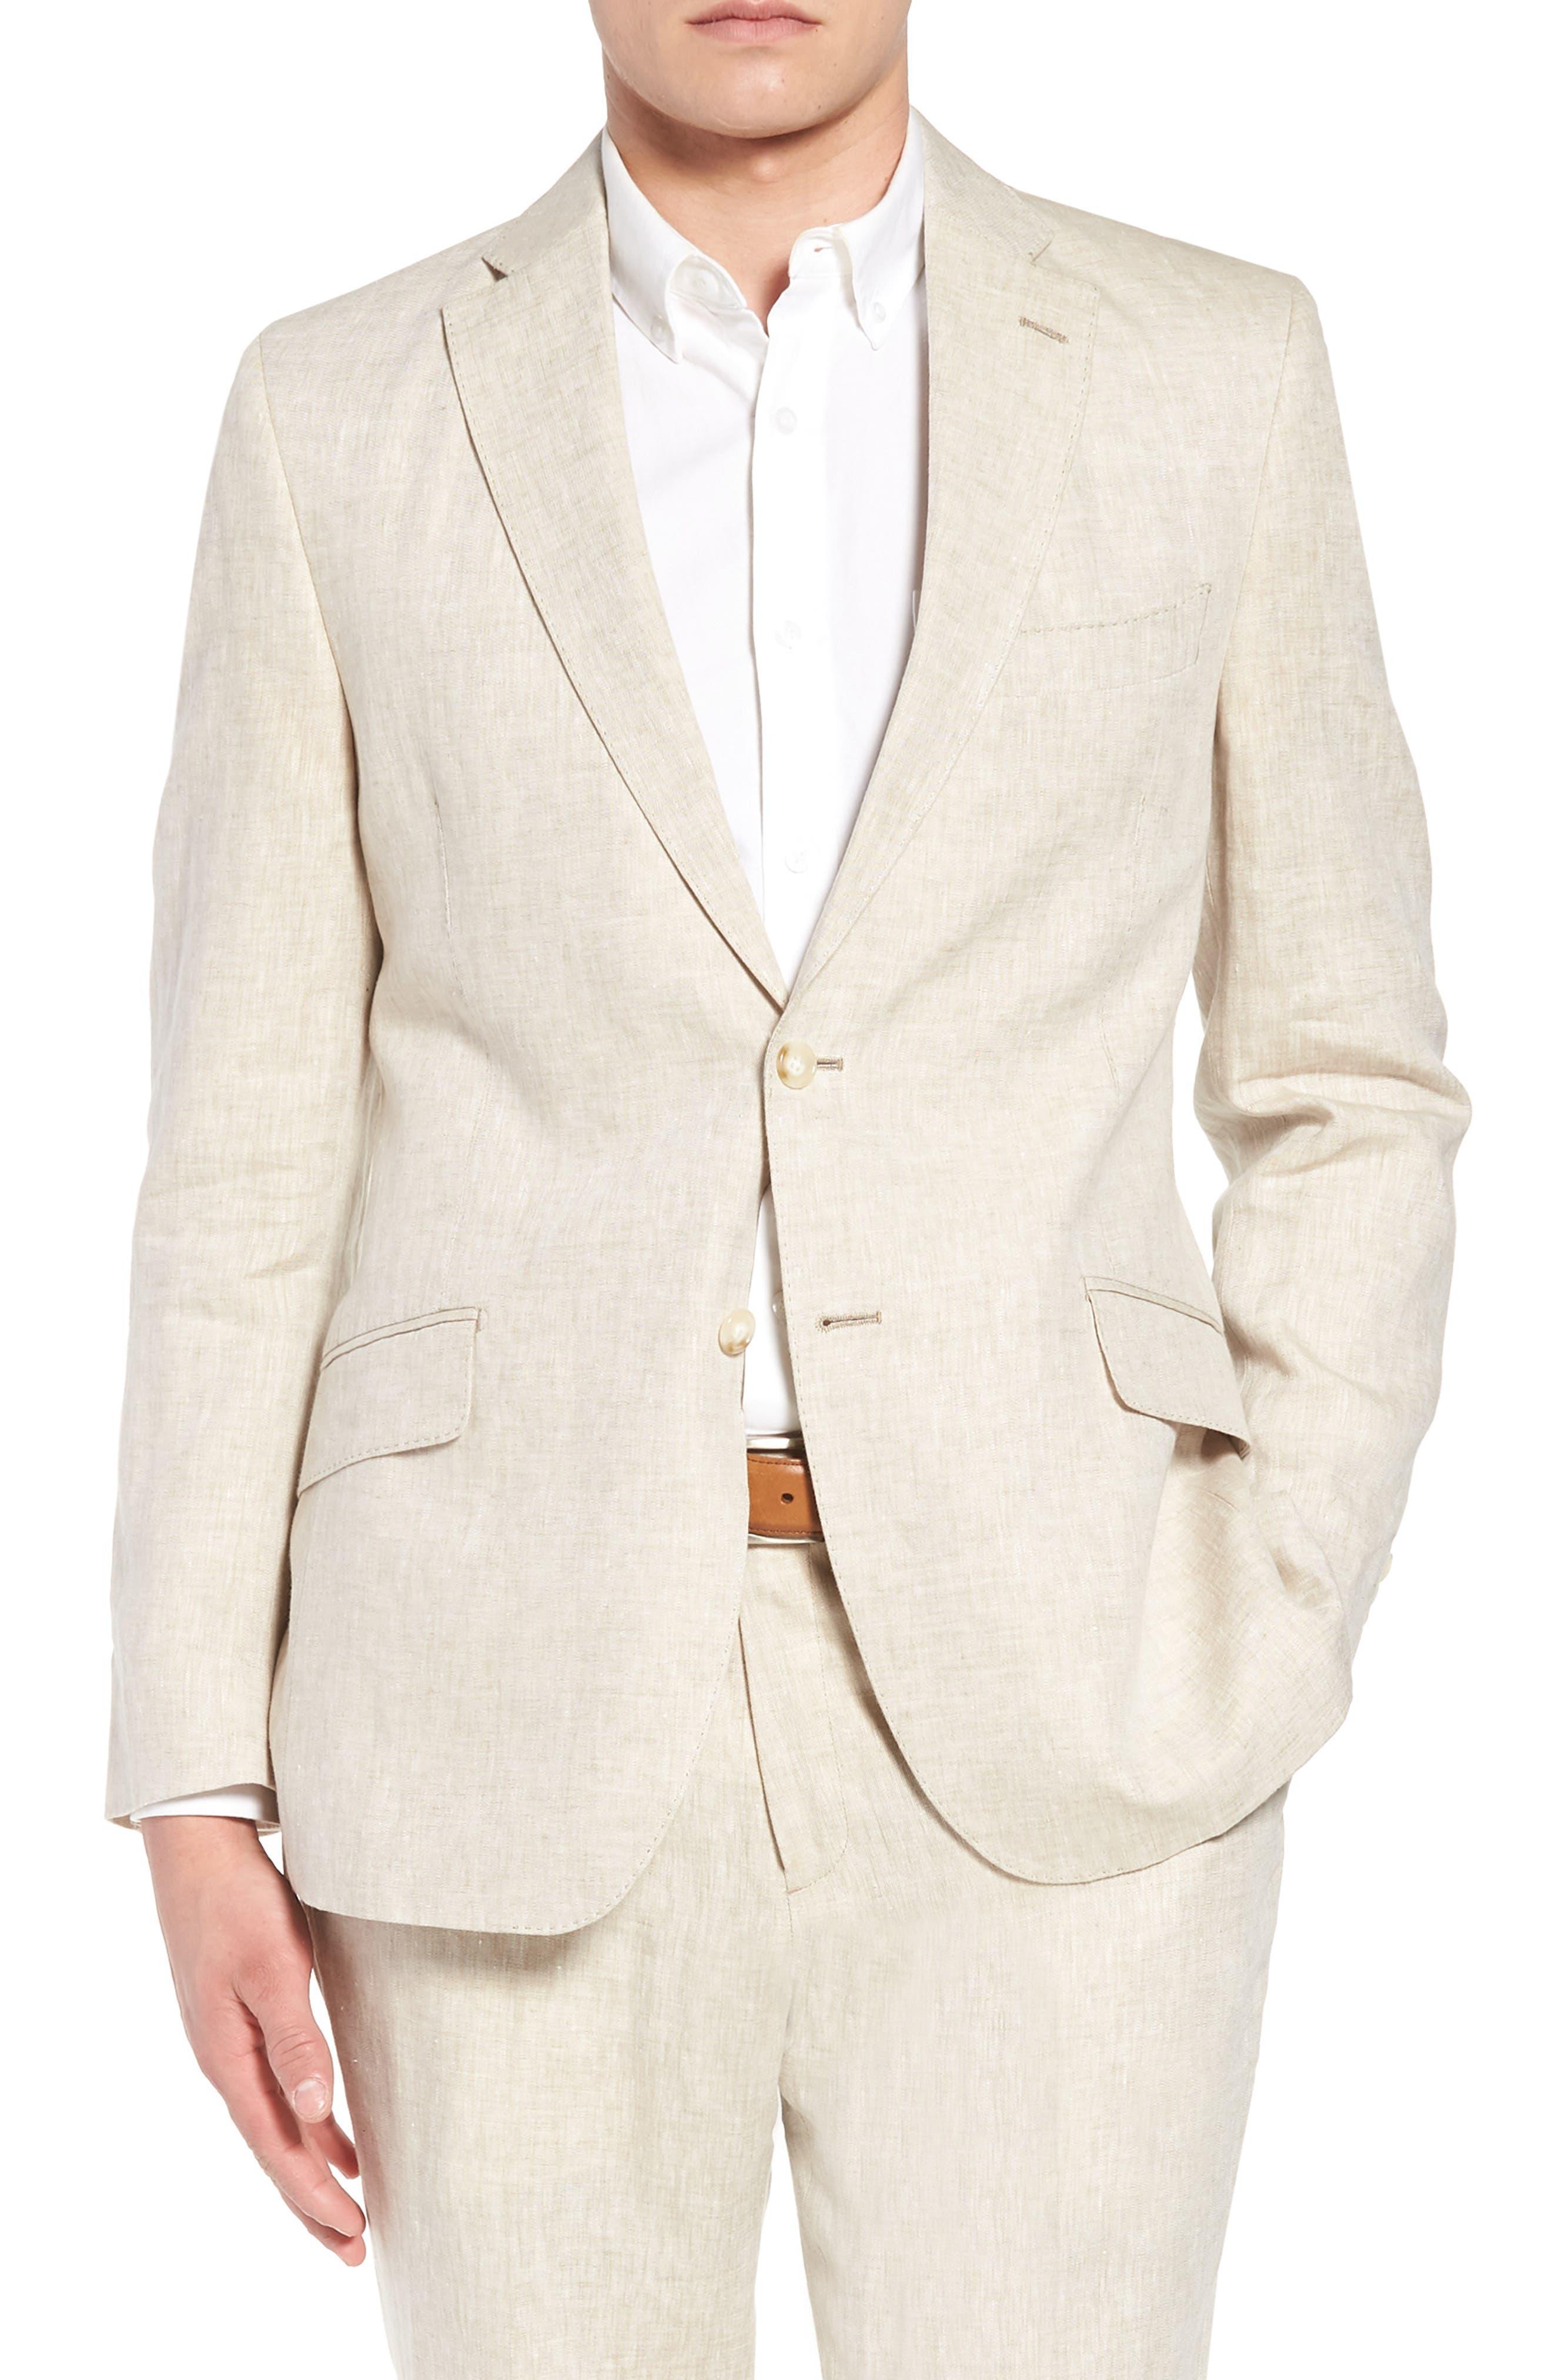 Kroon Jack AIM Classic Fit Linen Blazer